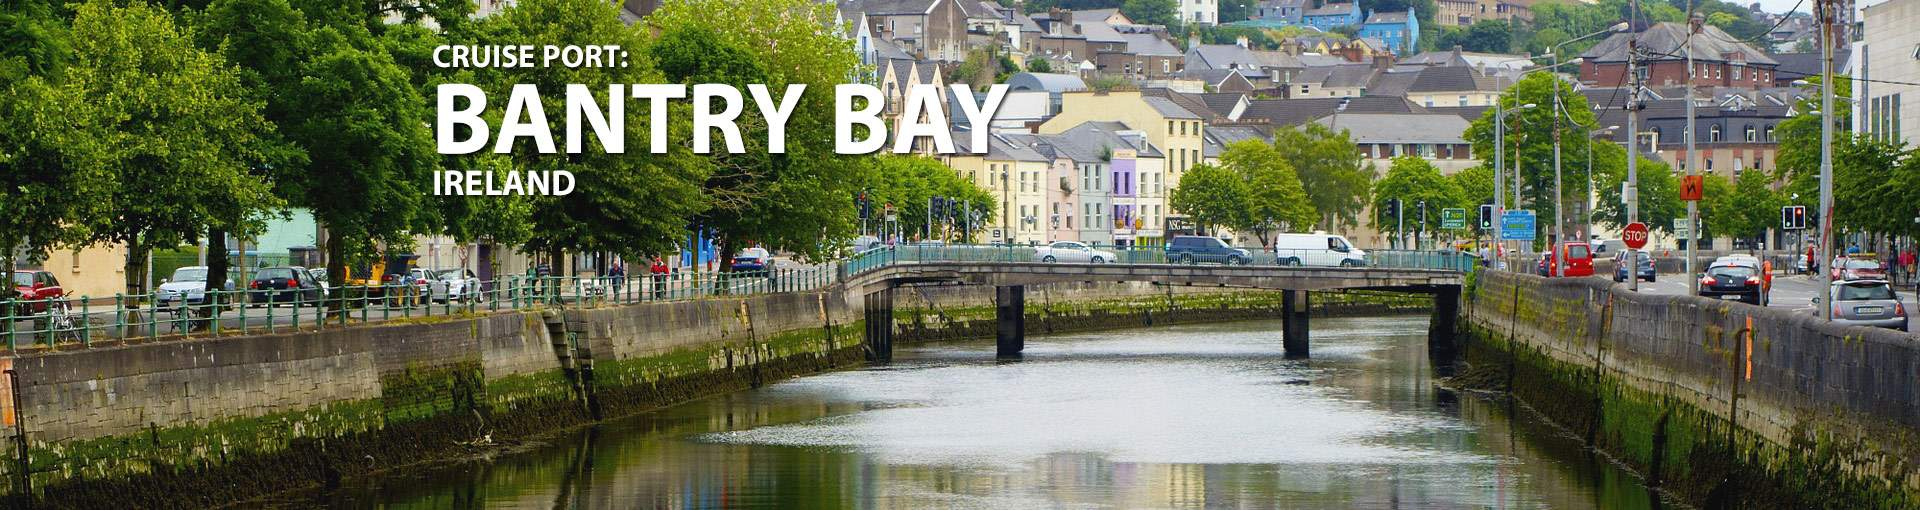 Banner for Bantry Bay, Ireland cruise port